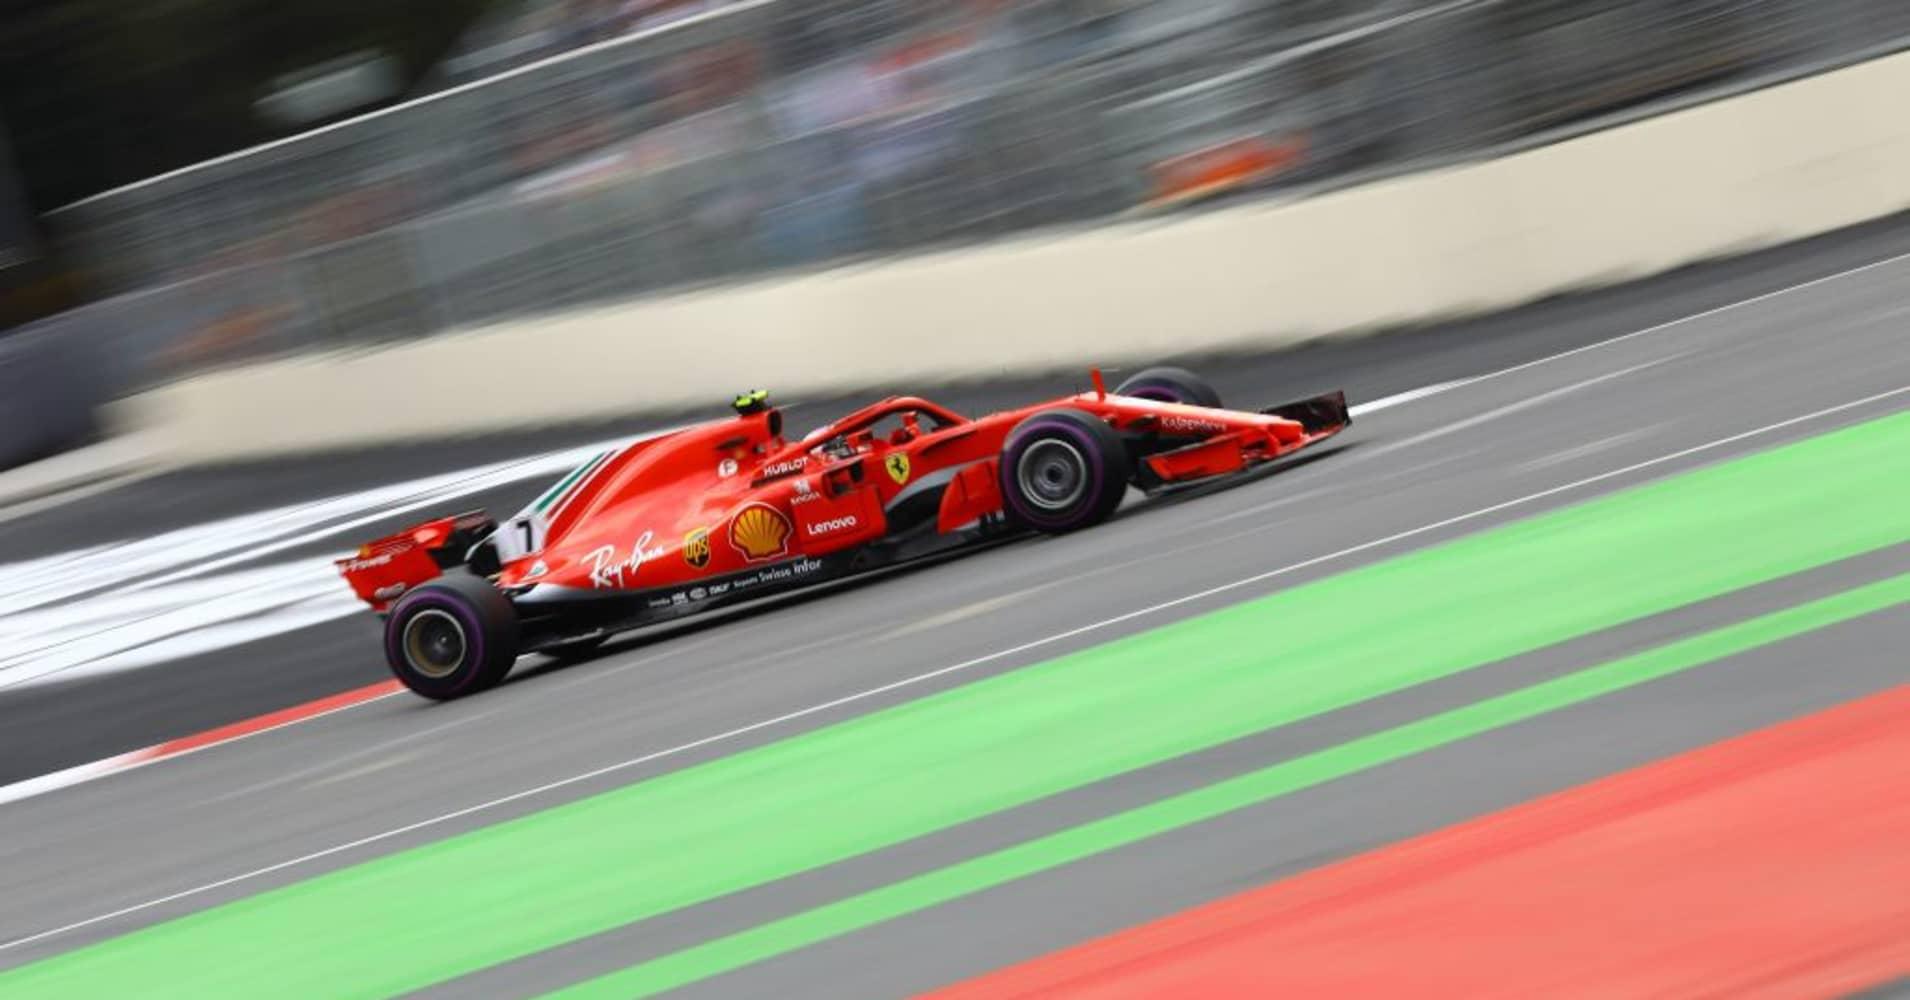 Kimi Raikkonen of Ferrari competes on track during the 4th round of Formula One World Championship Azerbaijan Grand Prix.